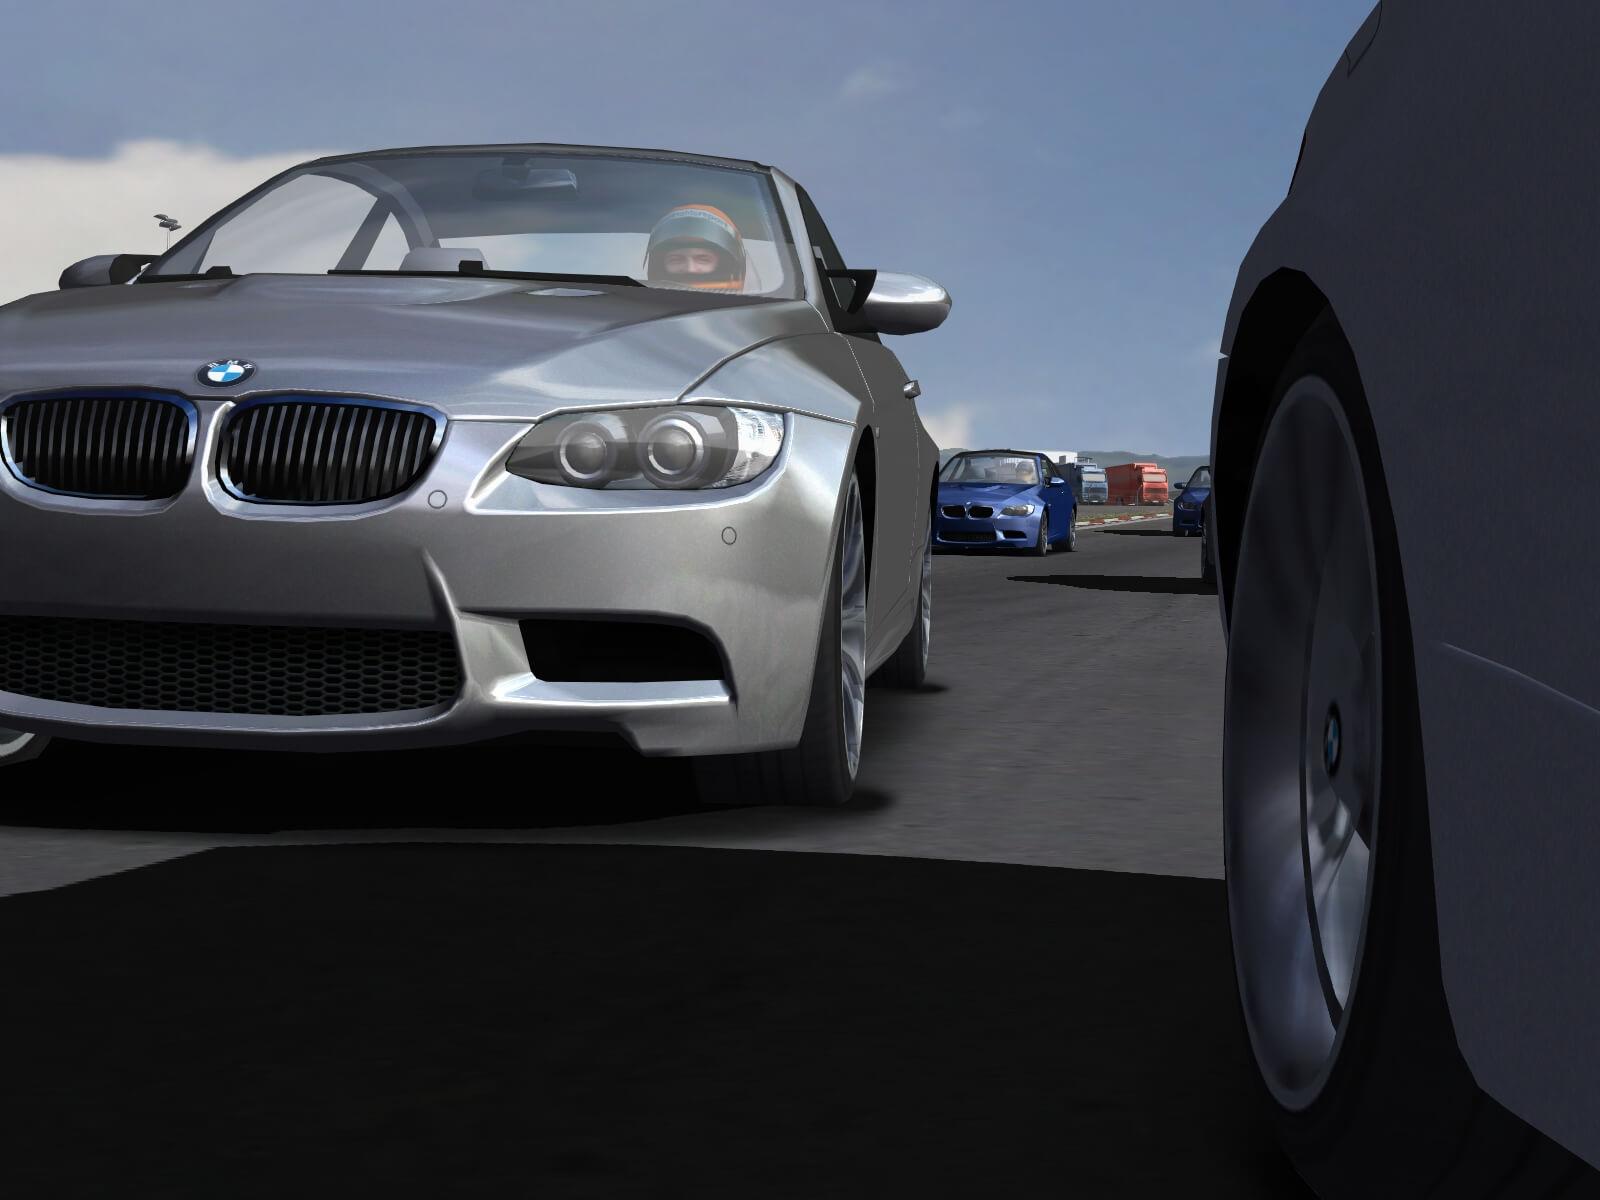 Download BMW M3 Challenge (Windows) - My Abandonware